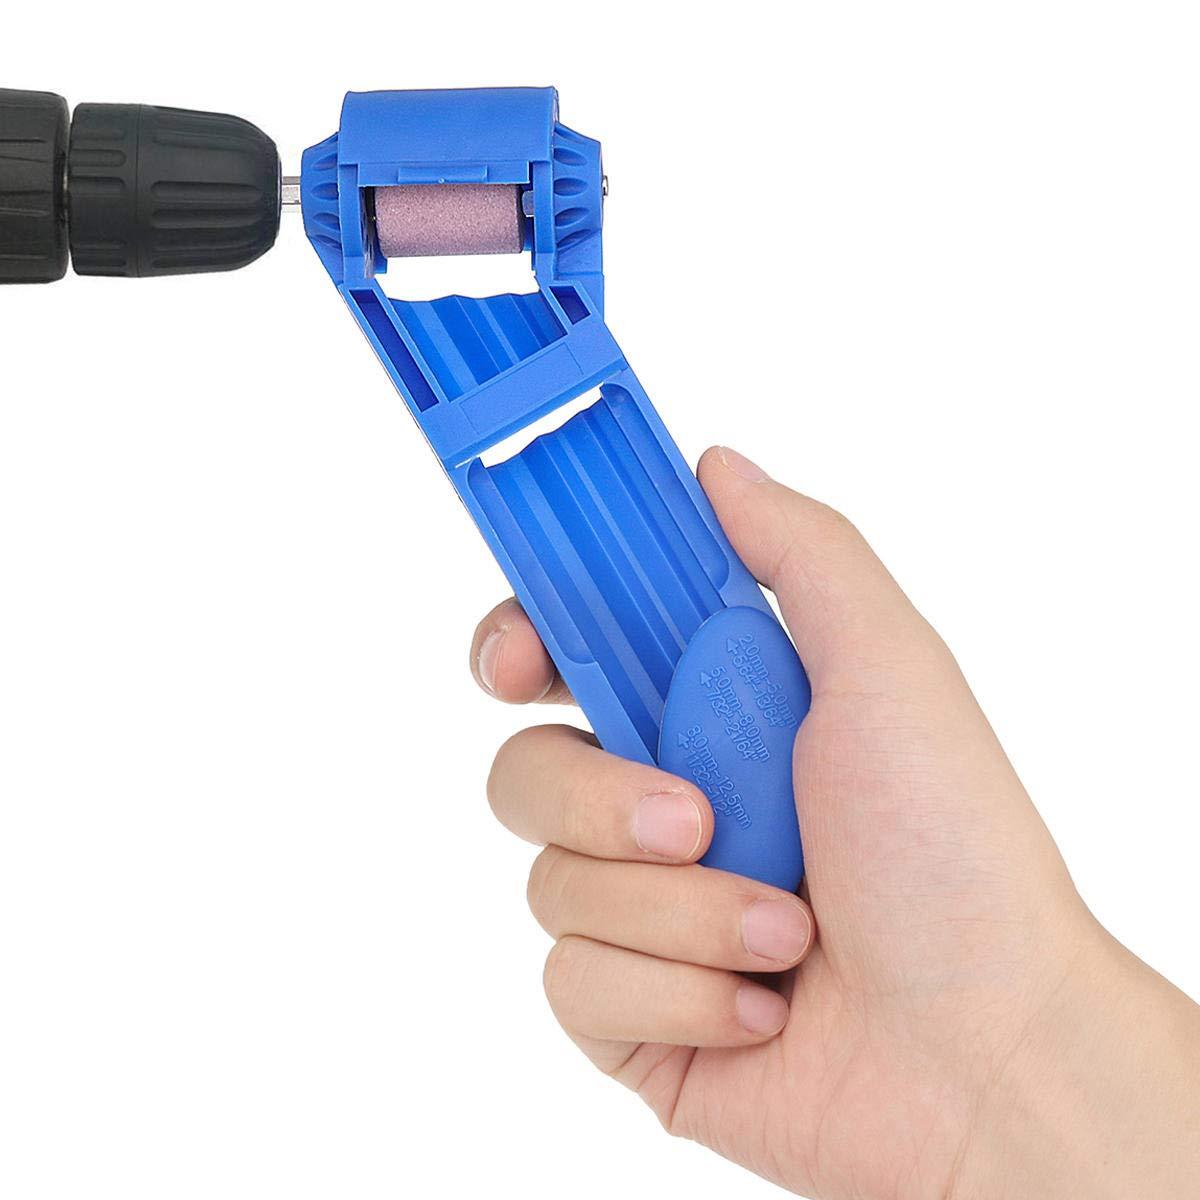 Effetool Portable Drill Bit Sharpener Corundum Grinding Wheel Hand Portable Powe